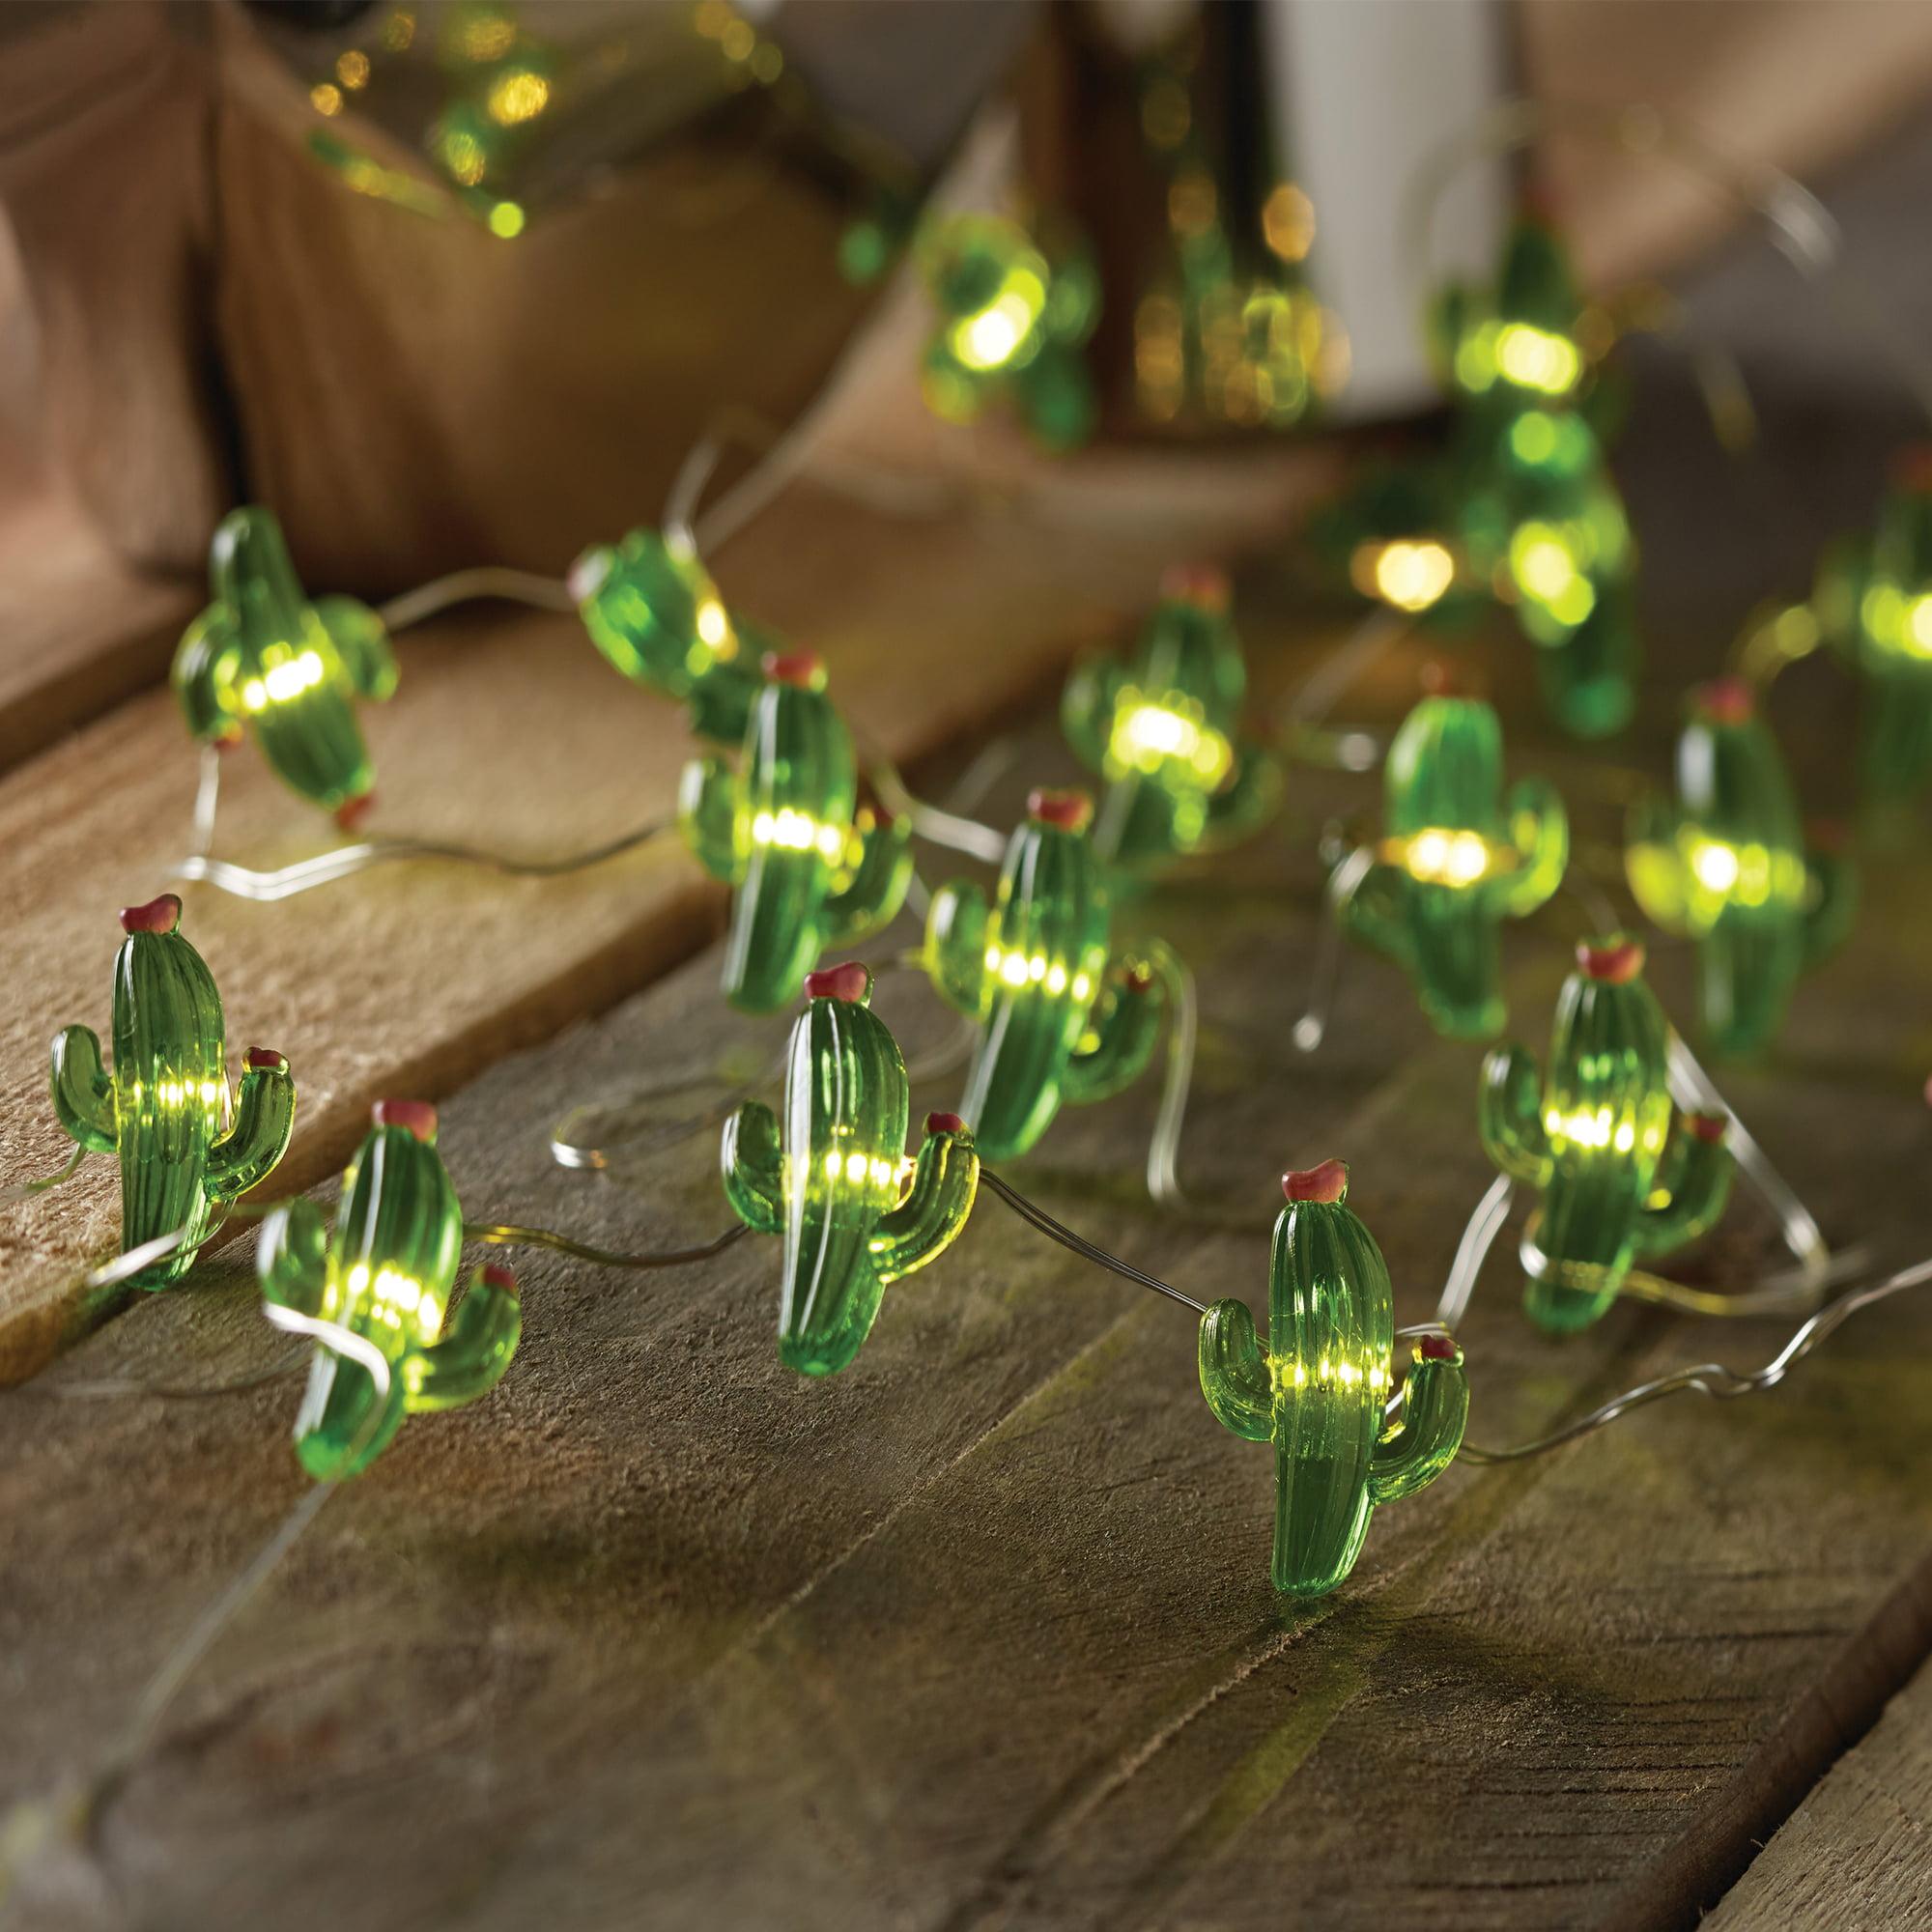 Mainstays Ms String Lights Assortment